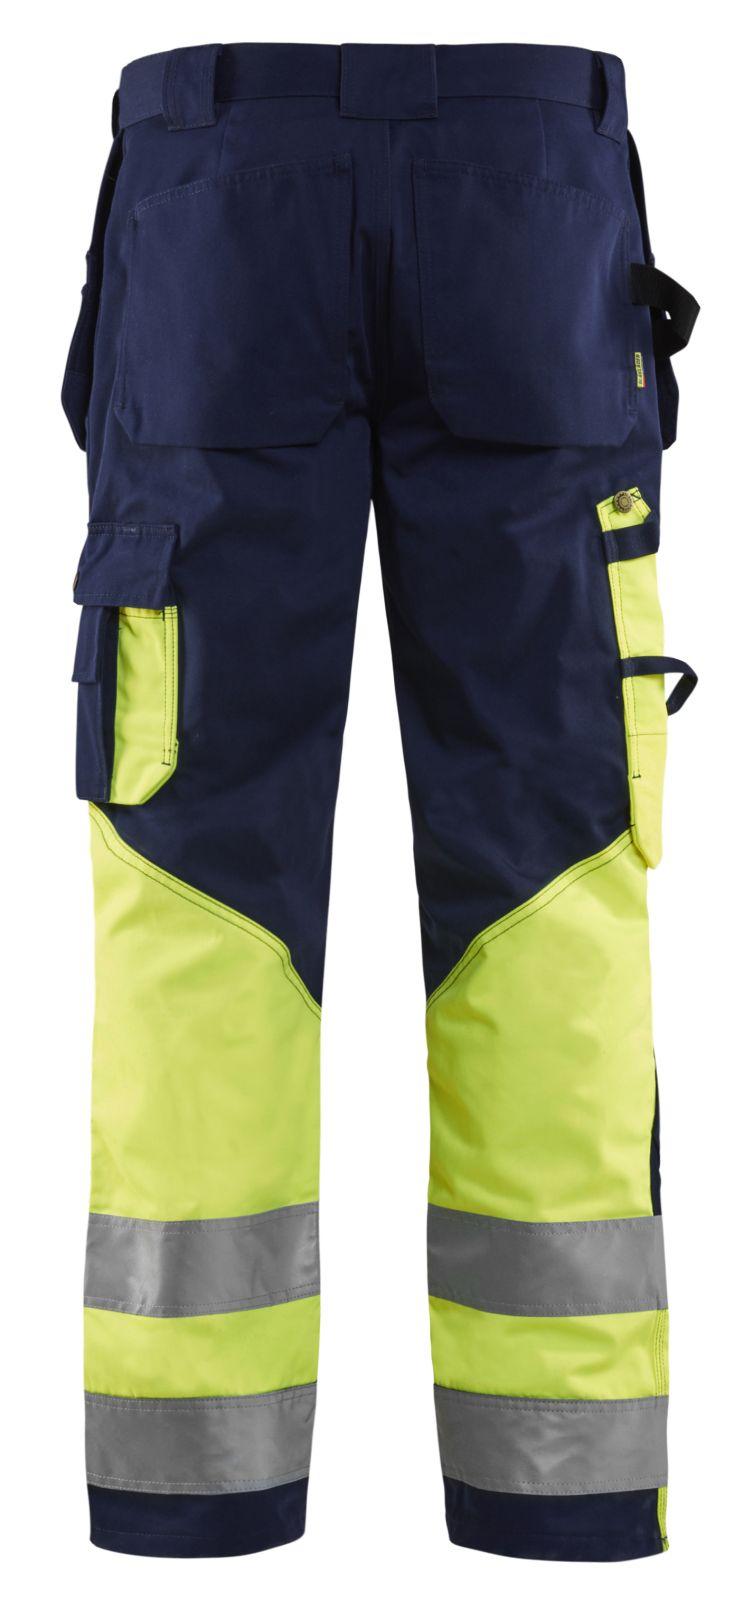 Blaklader Werkbroeken 15291860 High Vis marineblauw-geel(8933)